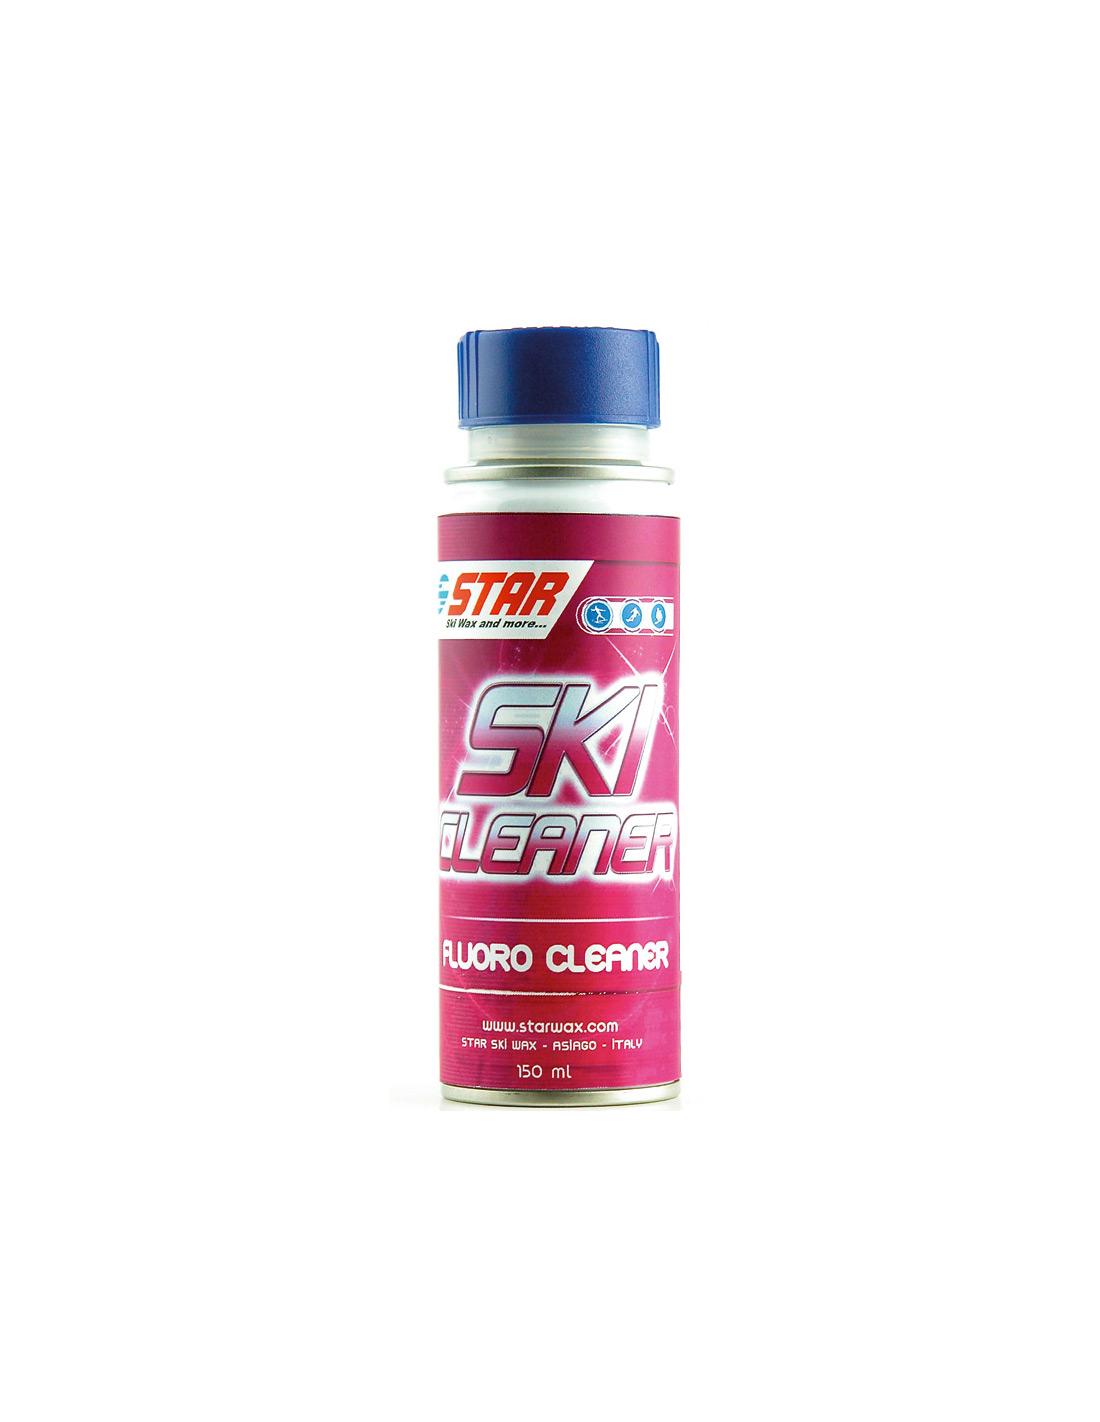 Ski fluoro cleanr